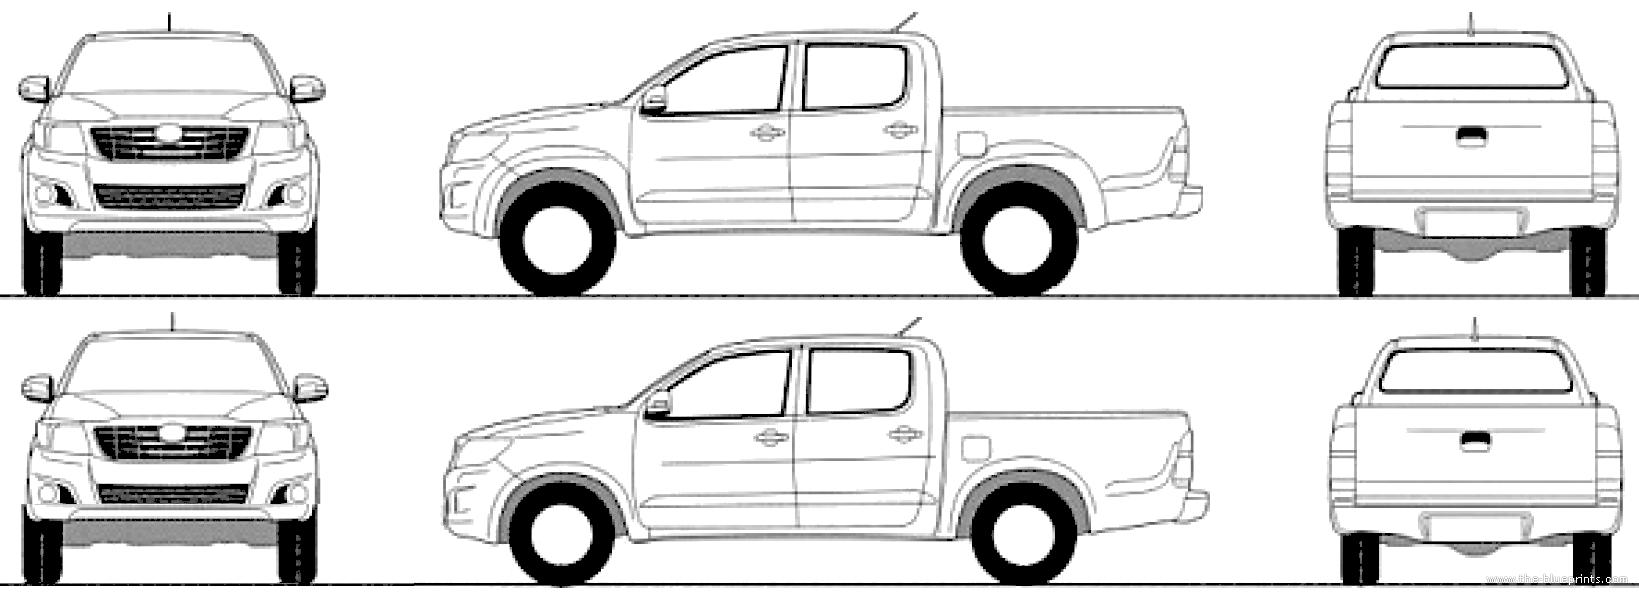 Free Hilux Blueprints: Blueprints > Cars > Toyota > Toyota Hilux (2015